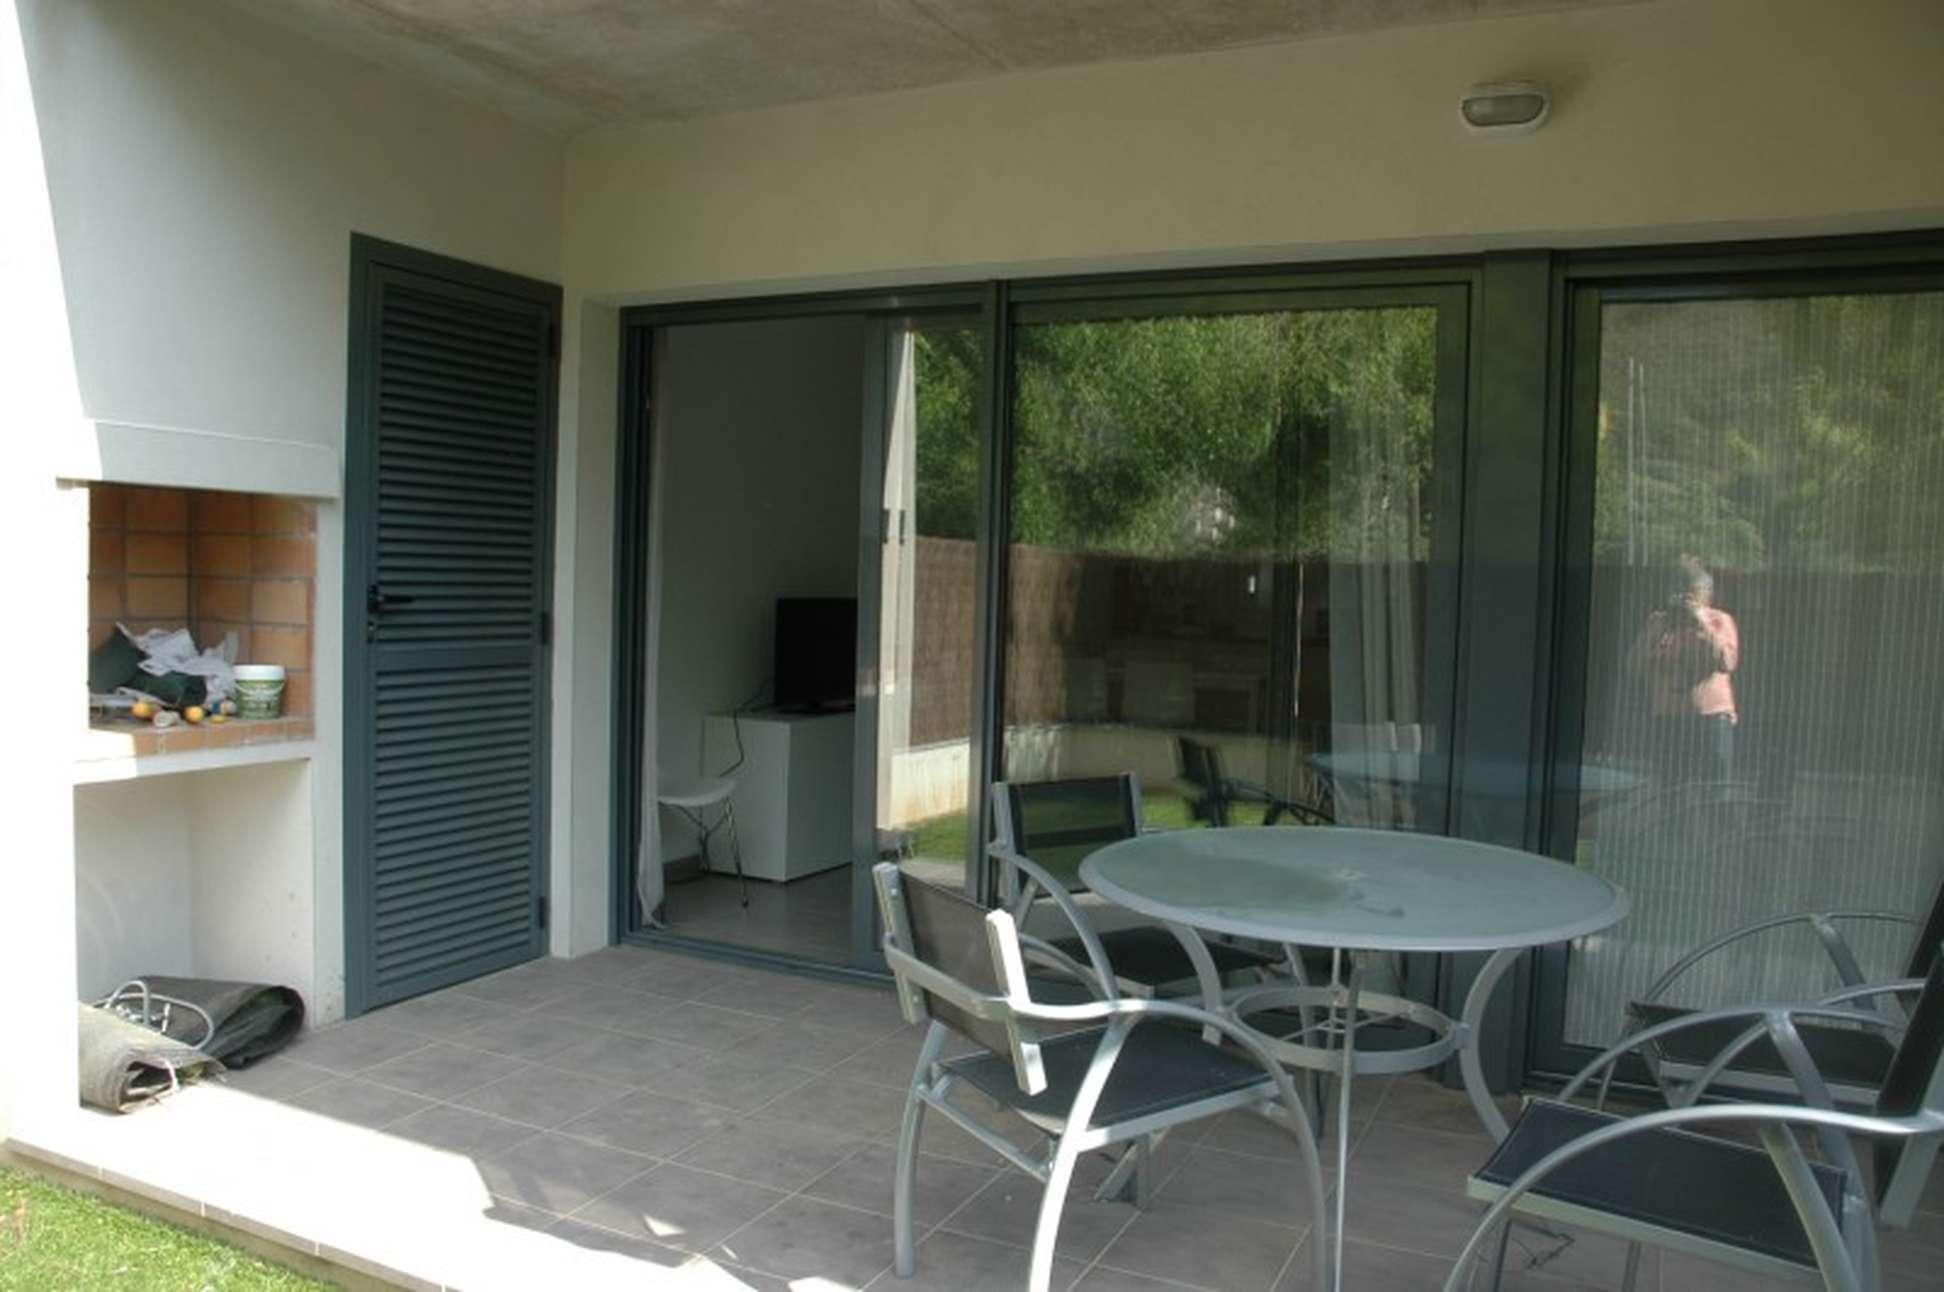 Alquiler tur stico planta baja con jard n terraza for Barbacoa y piscina madrid